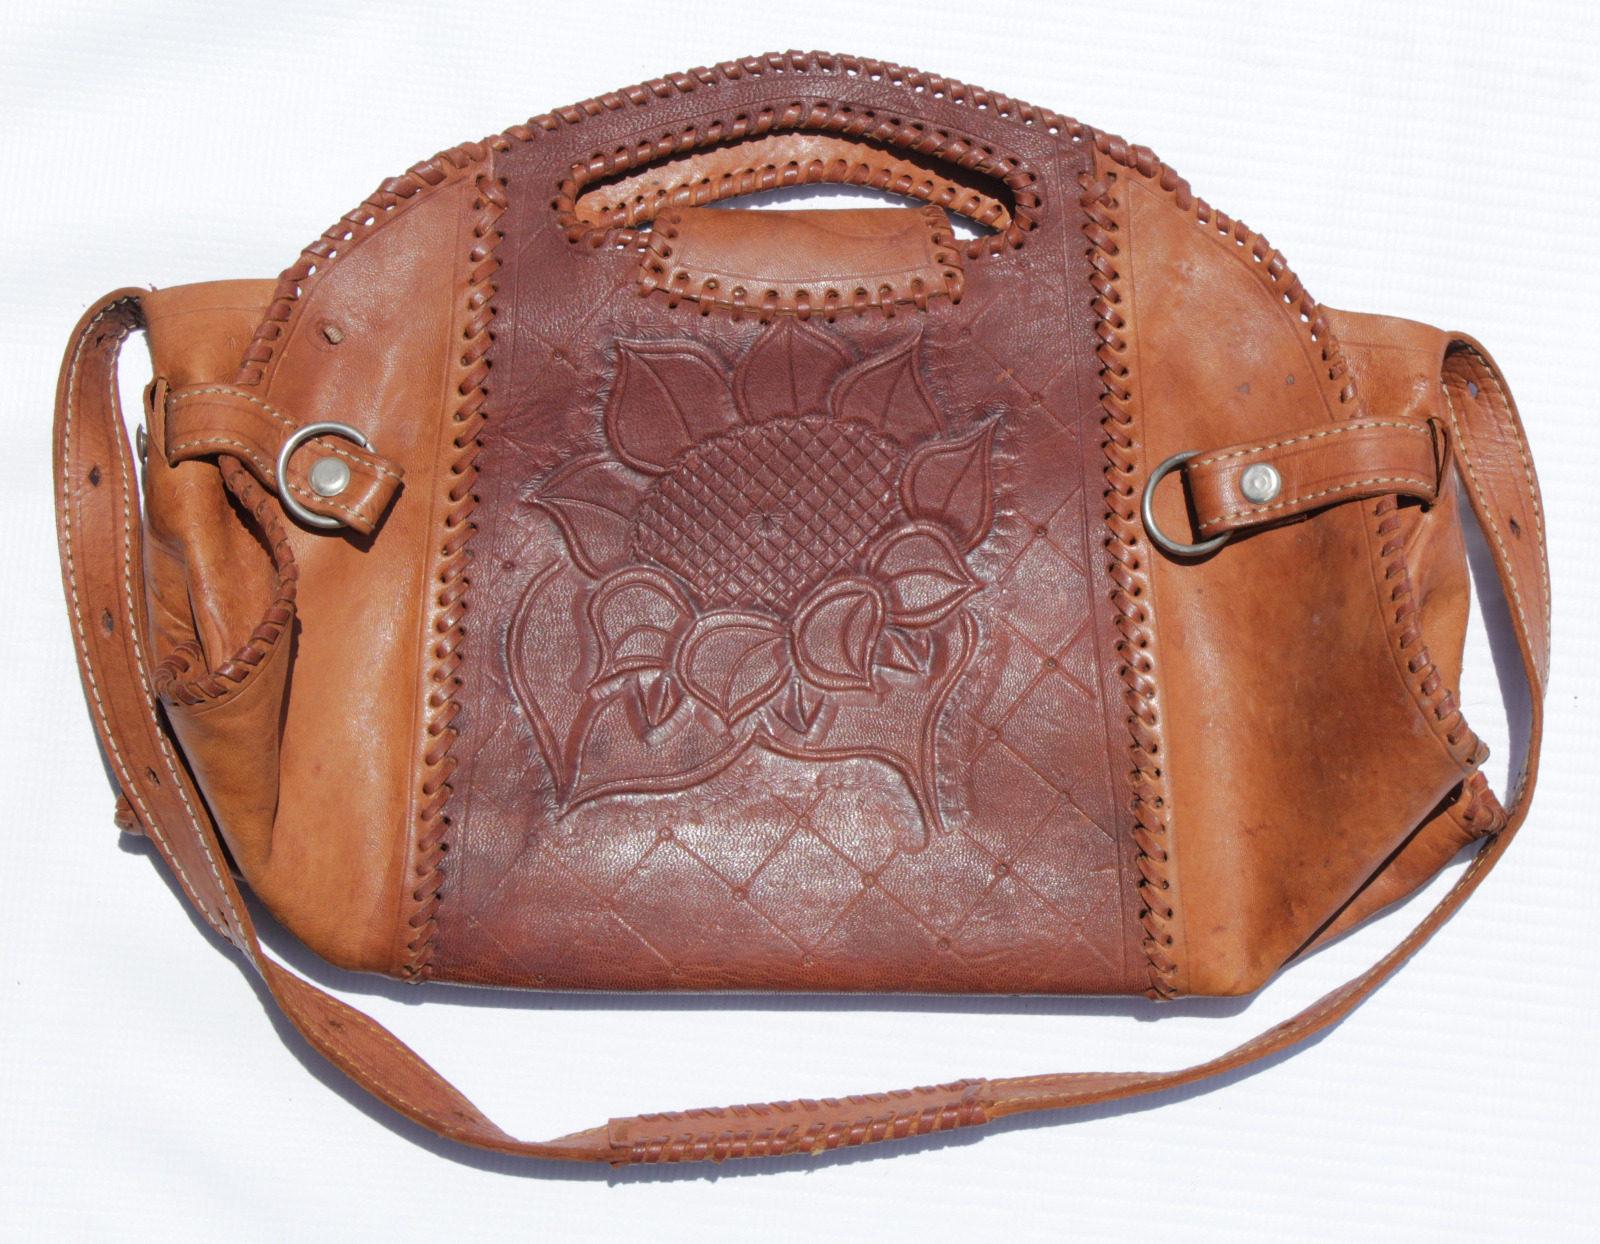 Two Toned Leather Handbag